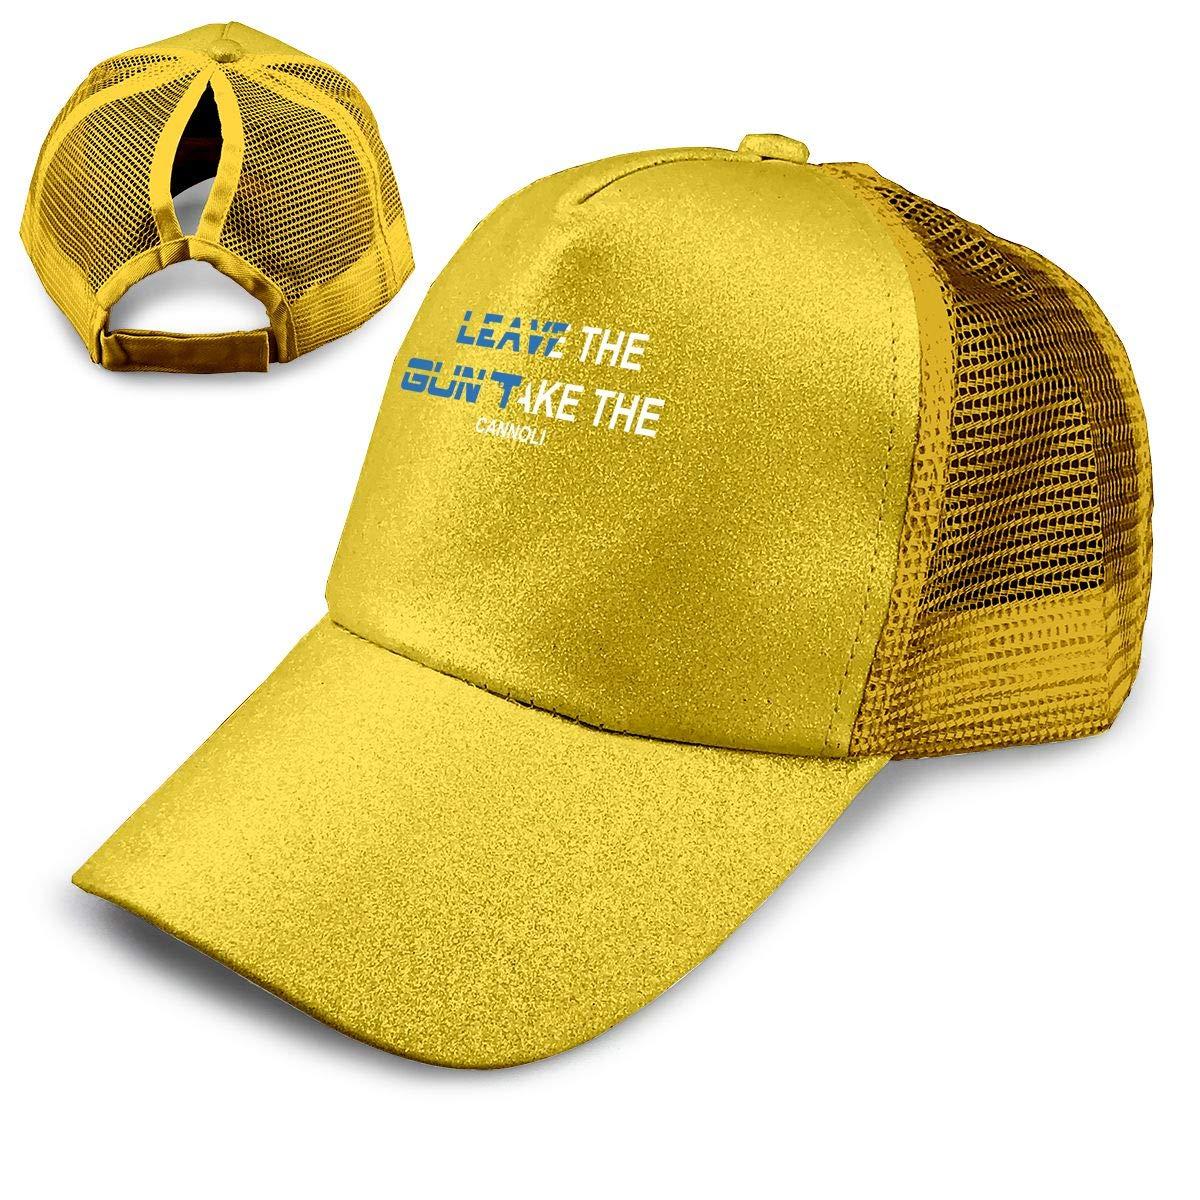 Jamaica Ponytail Messy High Bun Hat Ponycaps Baseball Cap Adjustable Trucker Cap Mesh Cap